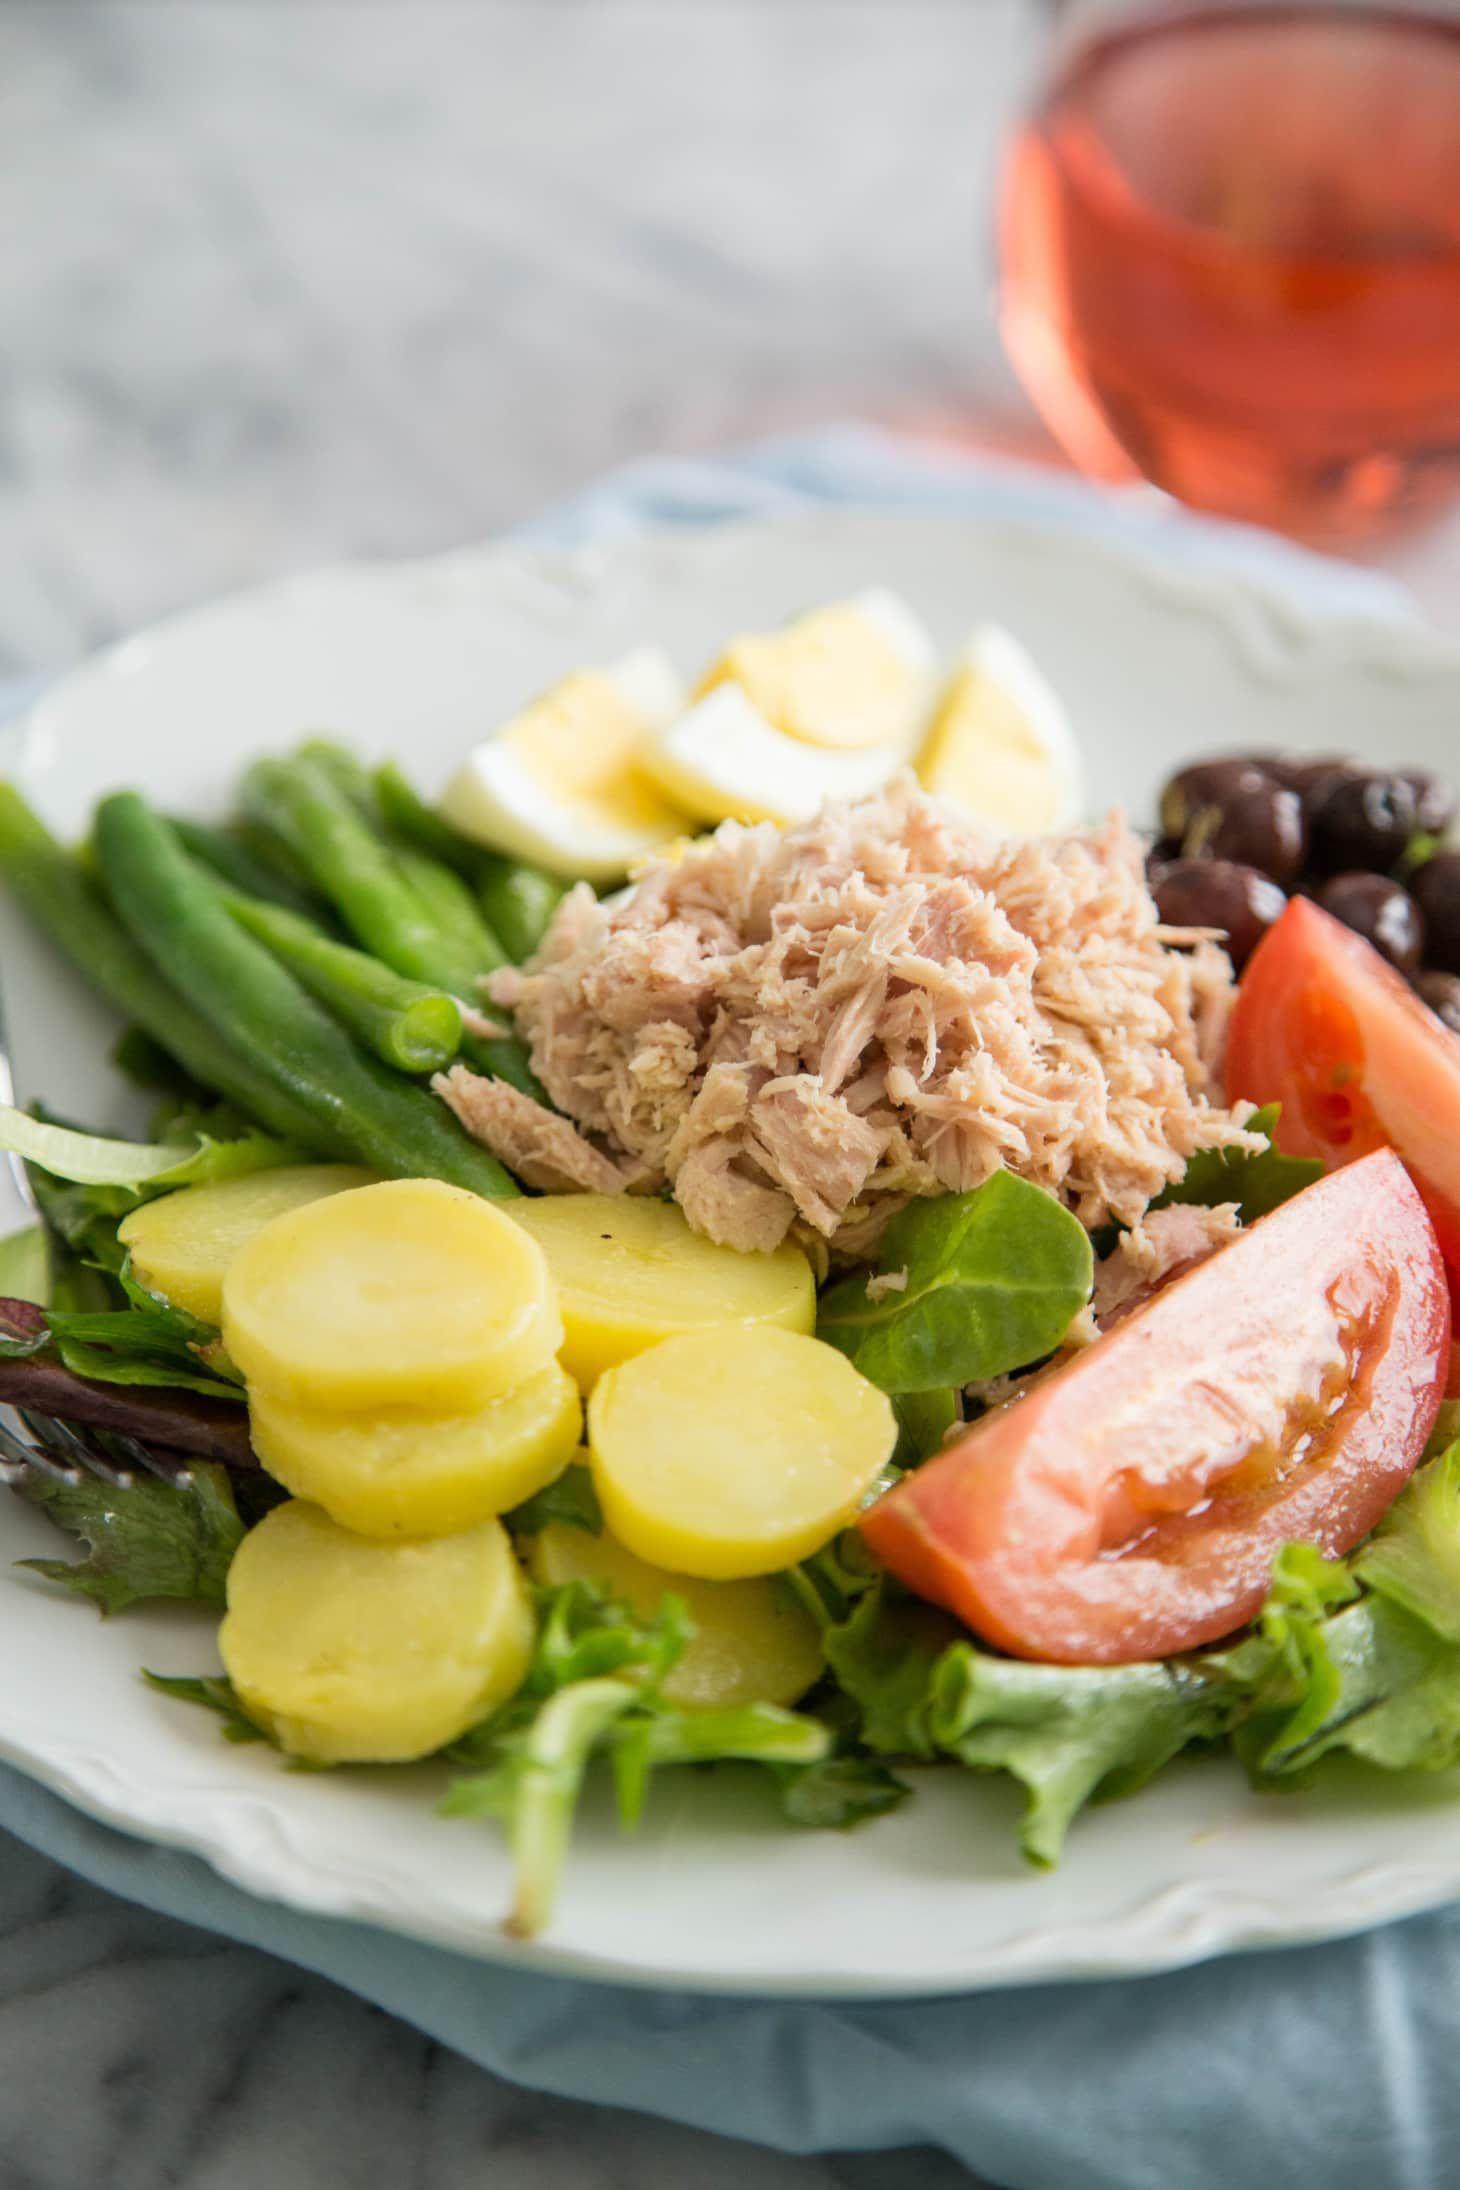 How To Make Nicoise Salad Recipe Nicoise salad, Easy